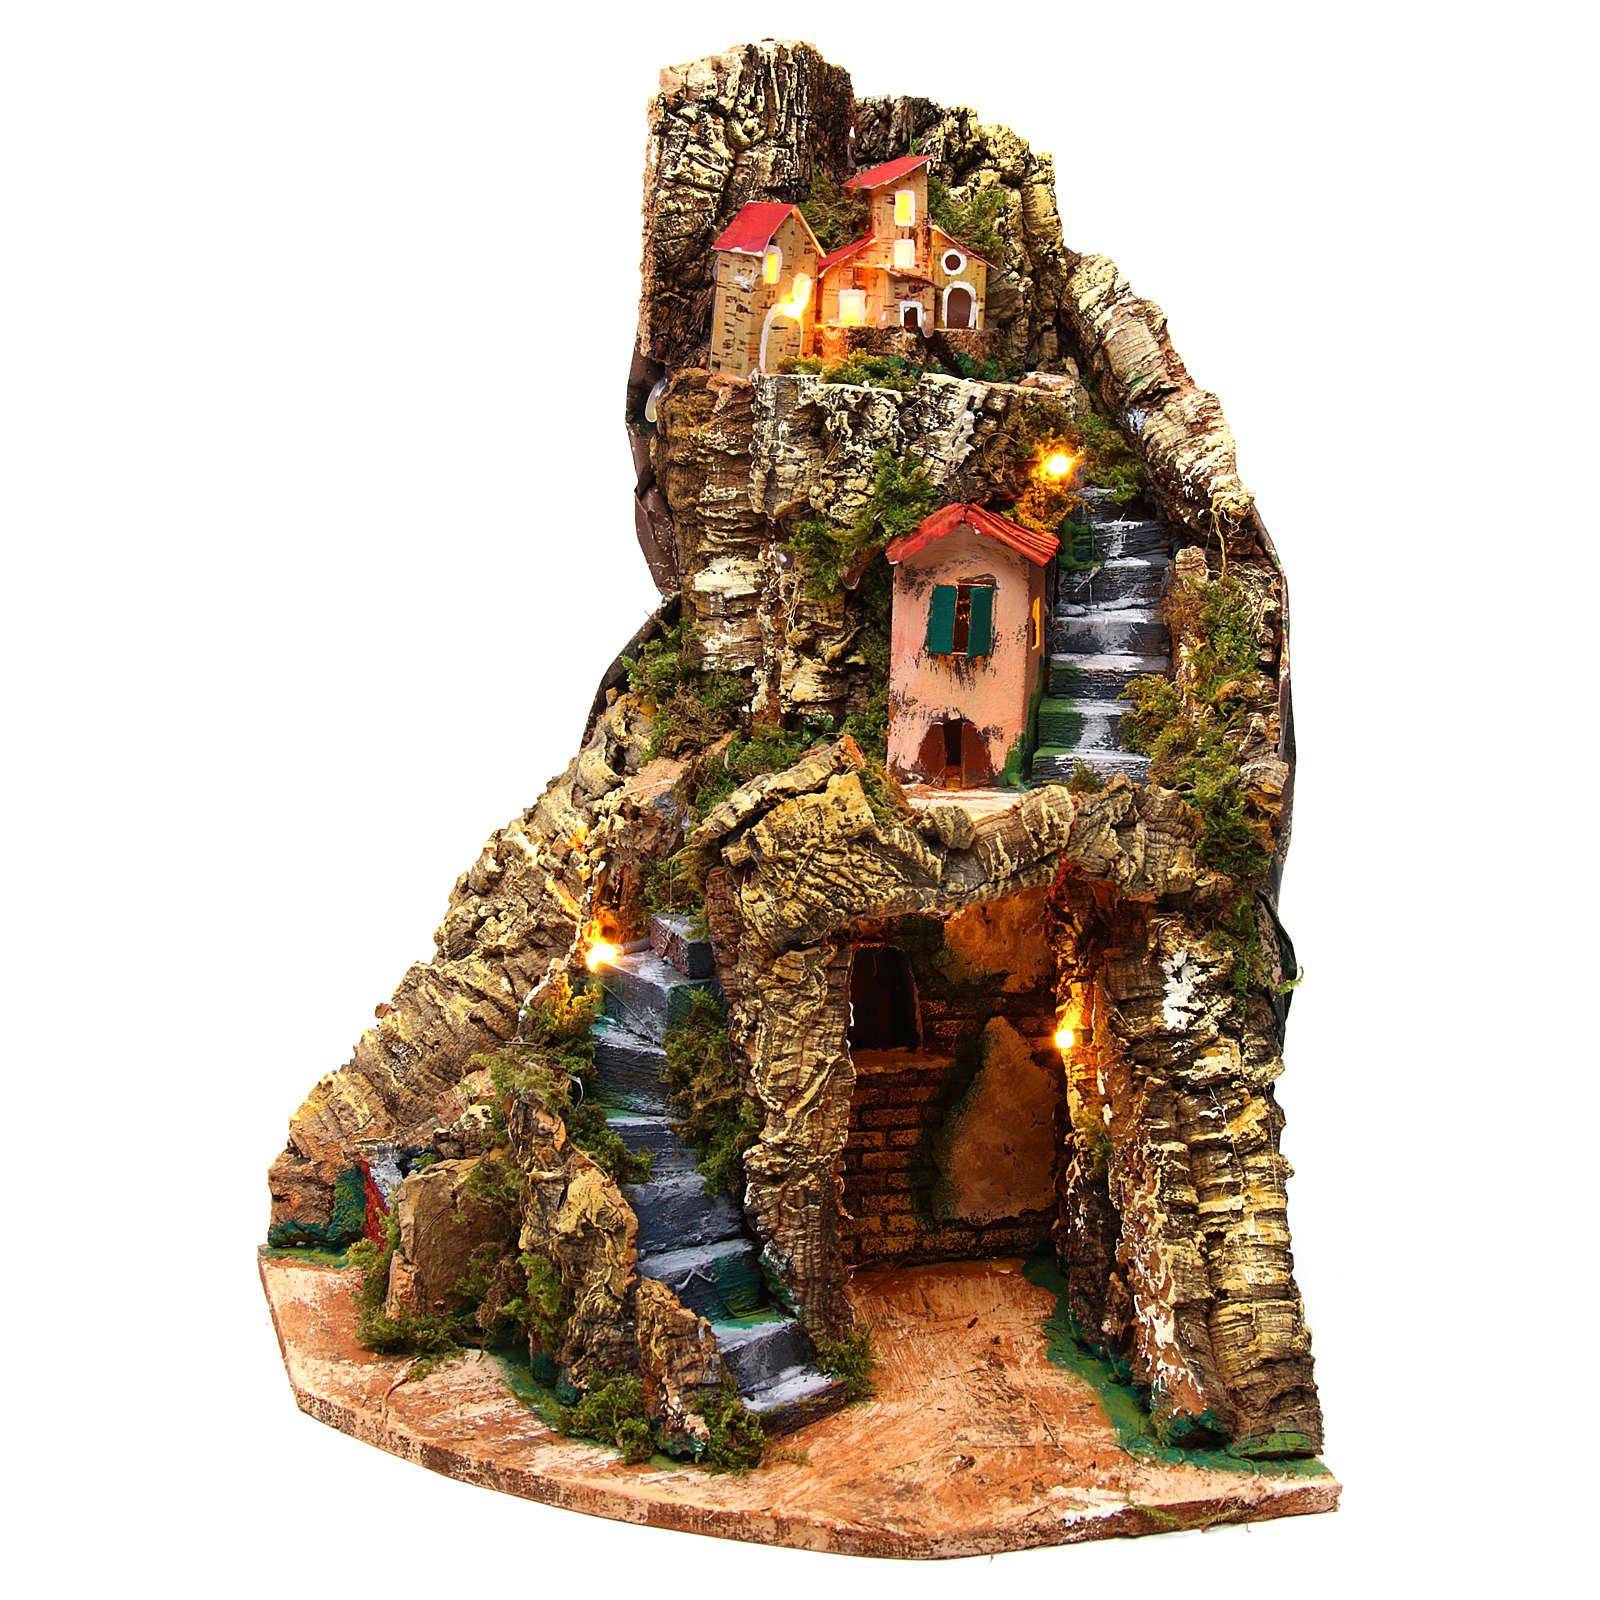 Nativity scene corner setting Neapolitan village 30x30x40 cm for 6-8 cm characters 4